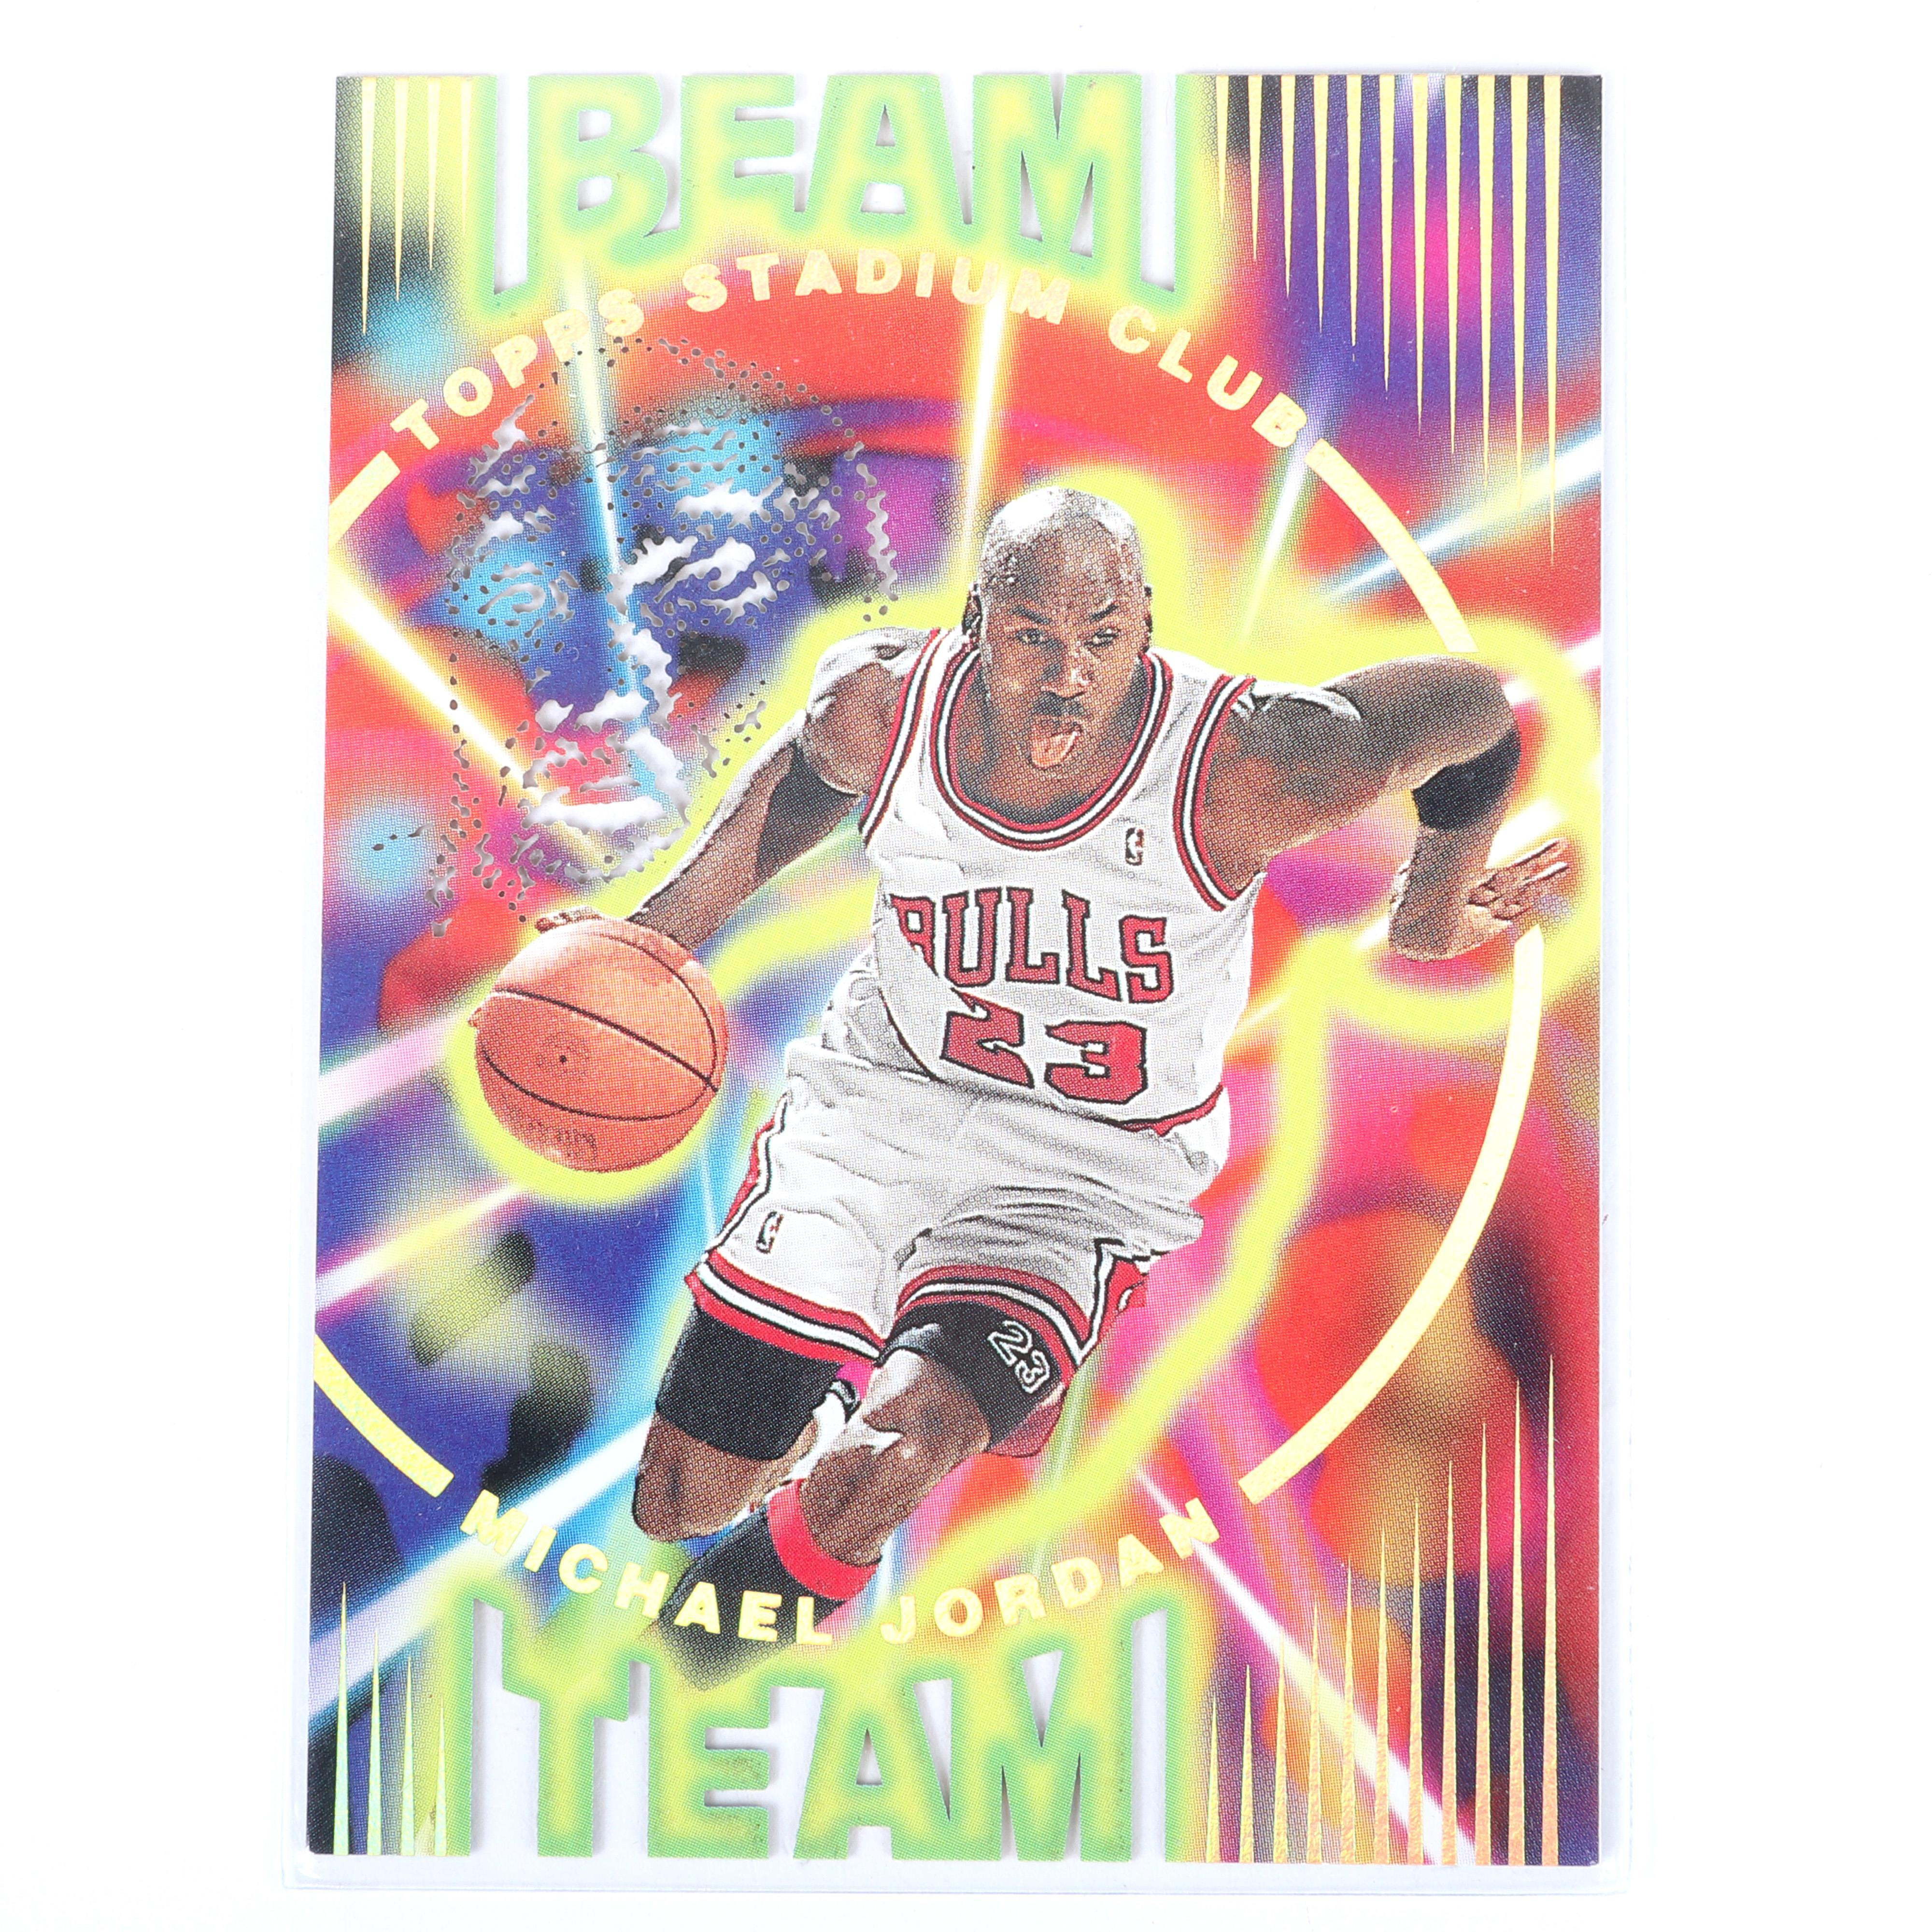 1995-96 Topps Stadium Club Michael Jordan Beam Team Insert #B14